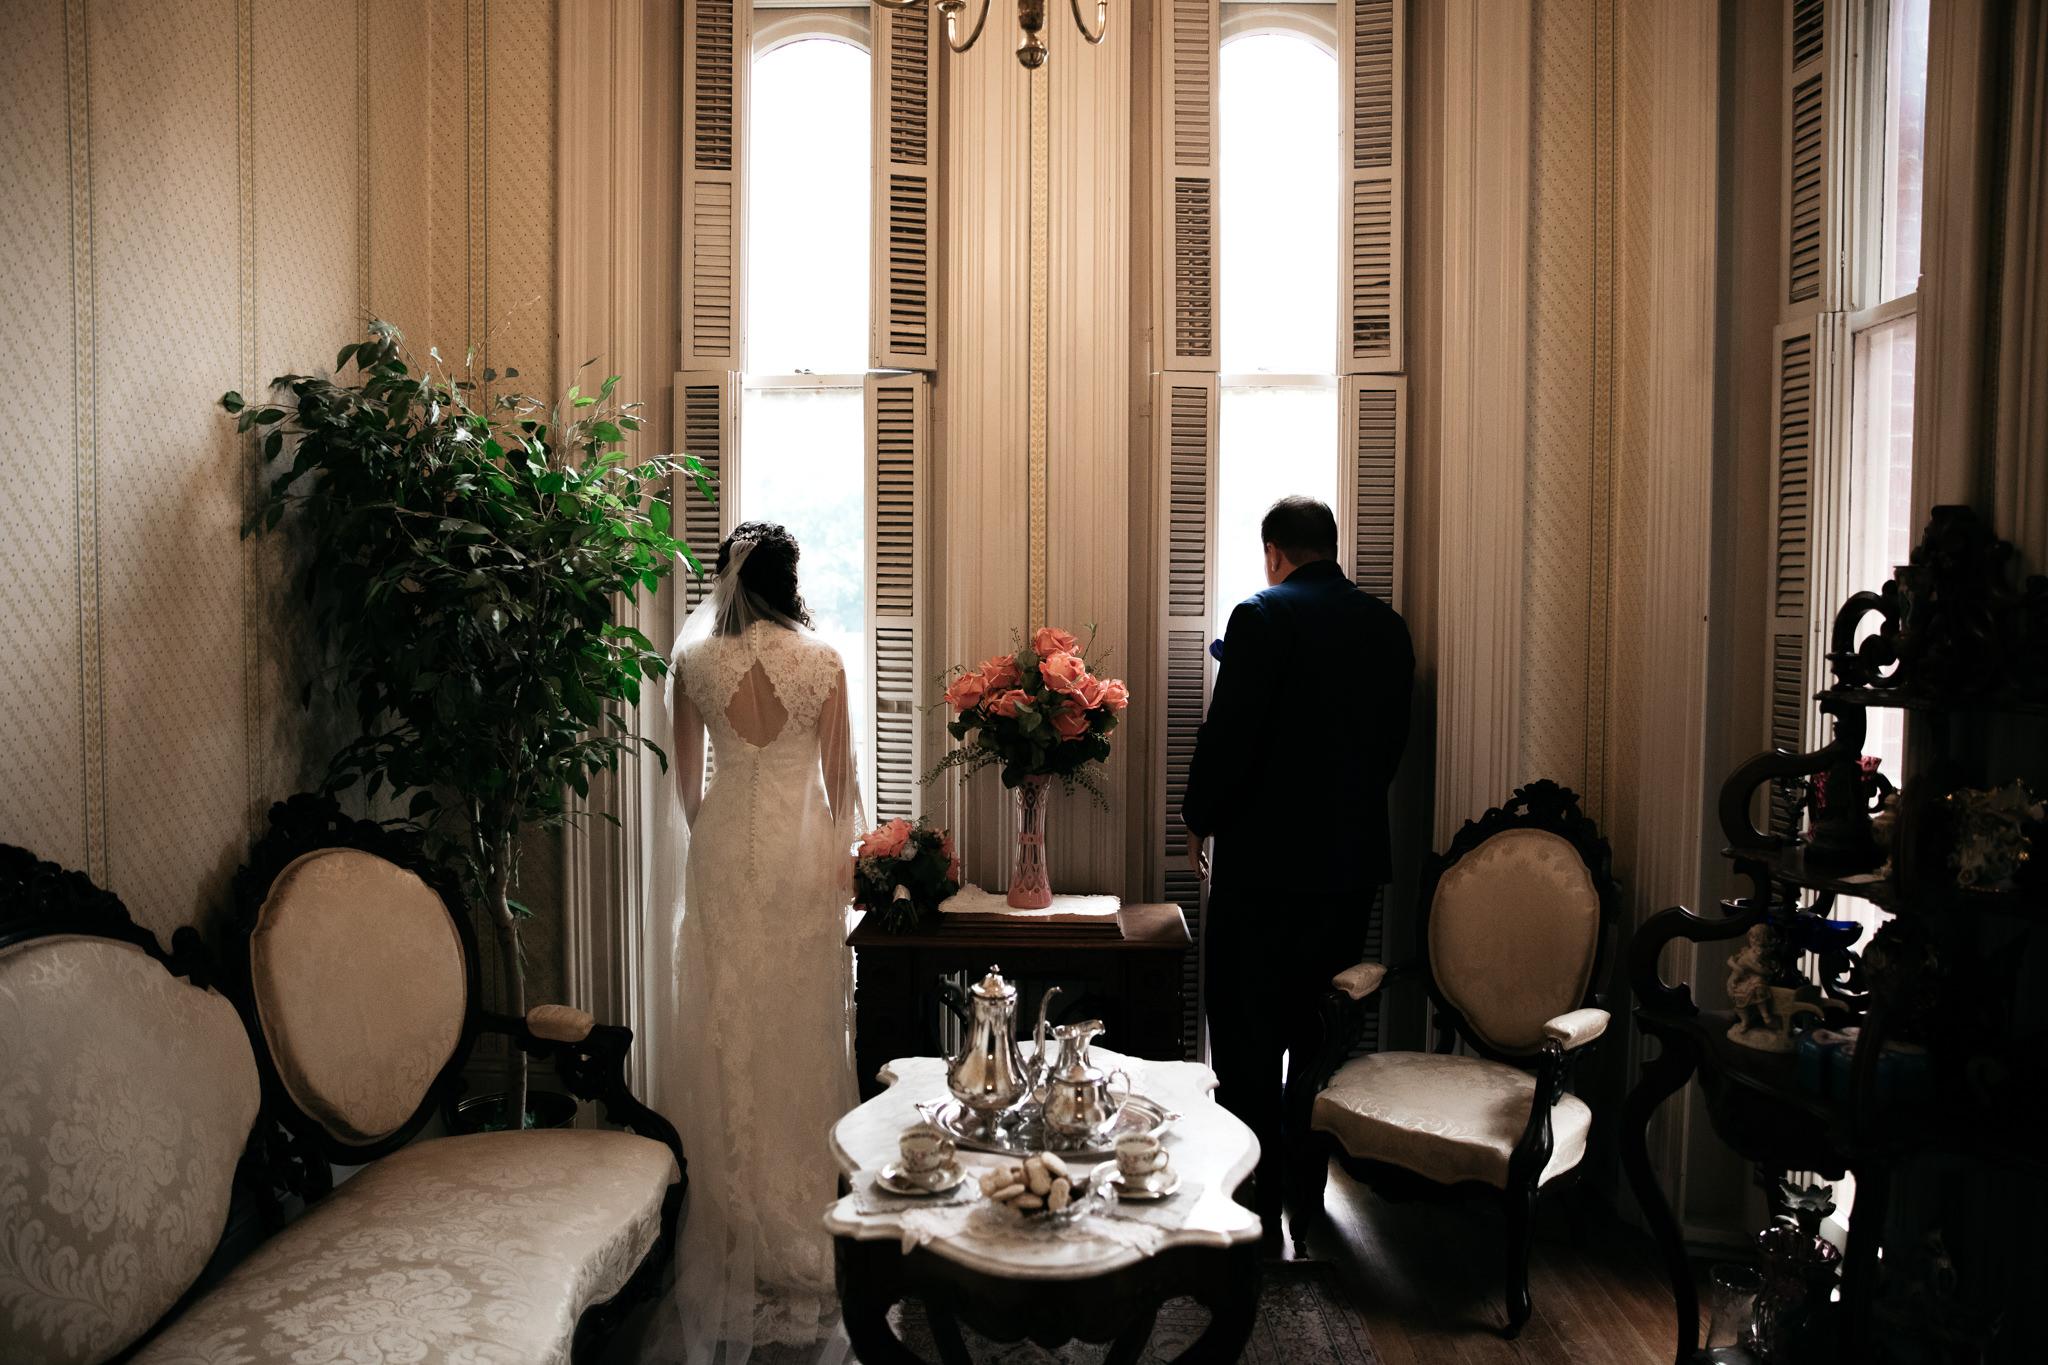 woodruff-fontaine-wedding-venue-memphis-thewarmtharoundyou-brenda-taylor-1-2.jpg